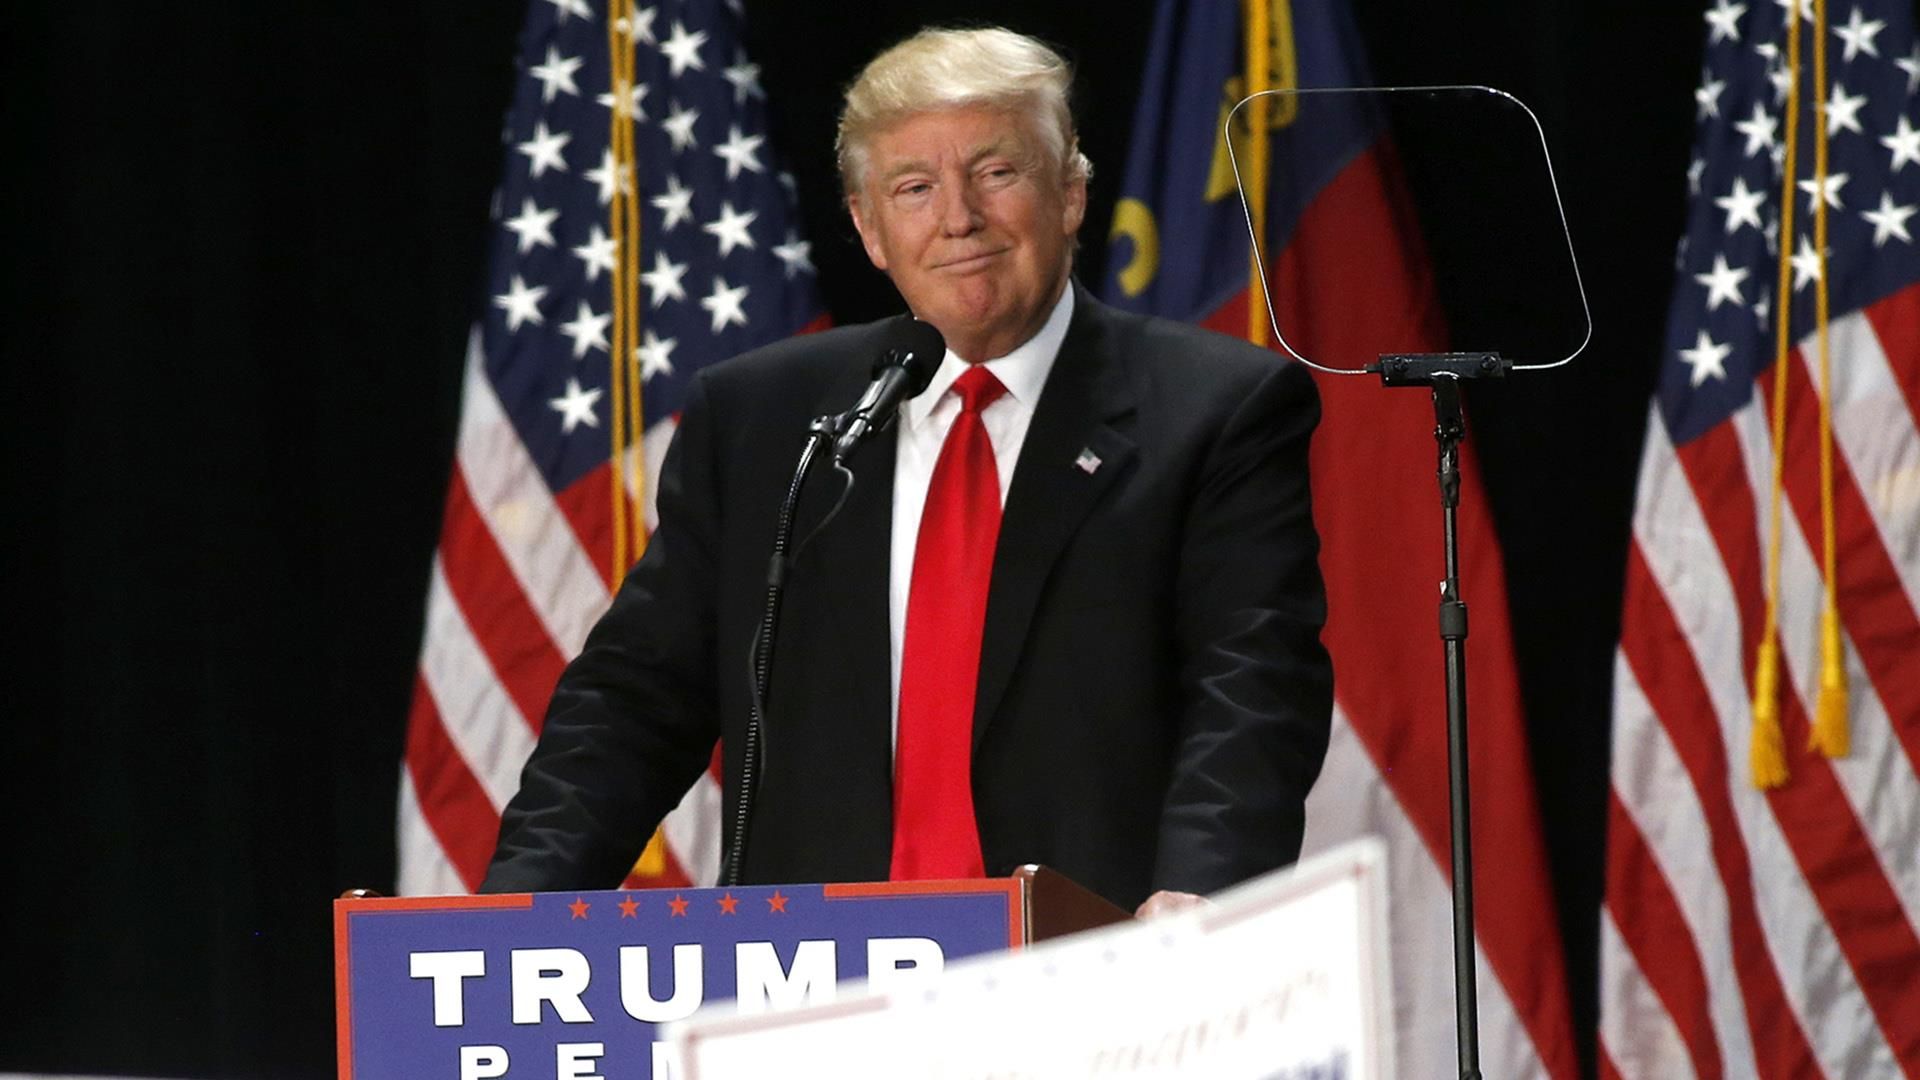 Donald Trump: I regret not choosing the right words